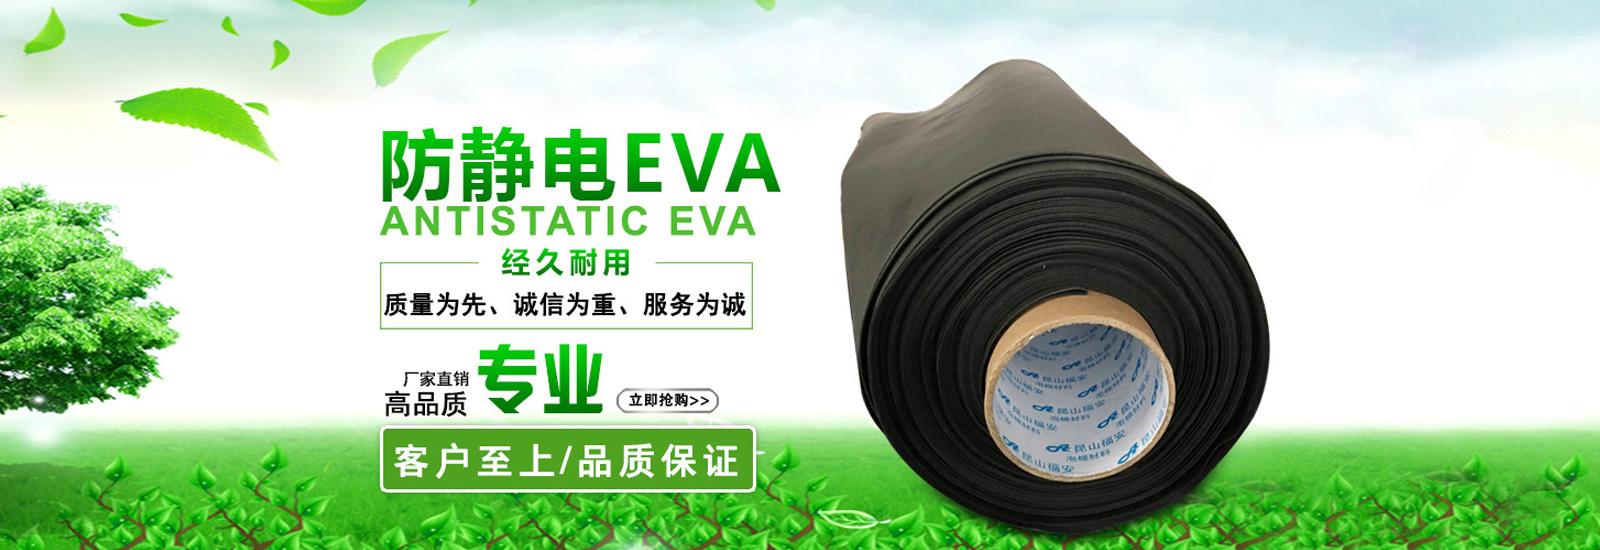 EVA材料加工